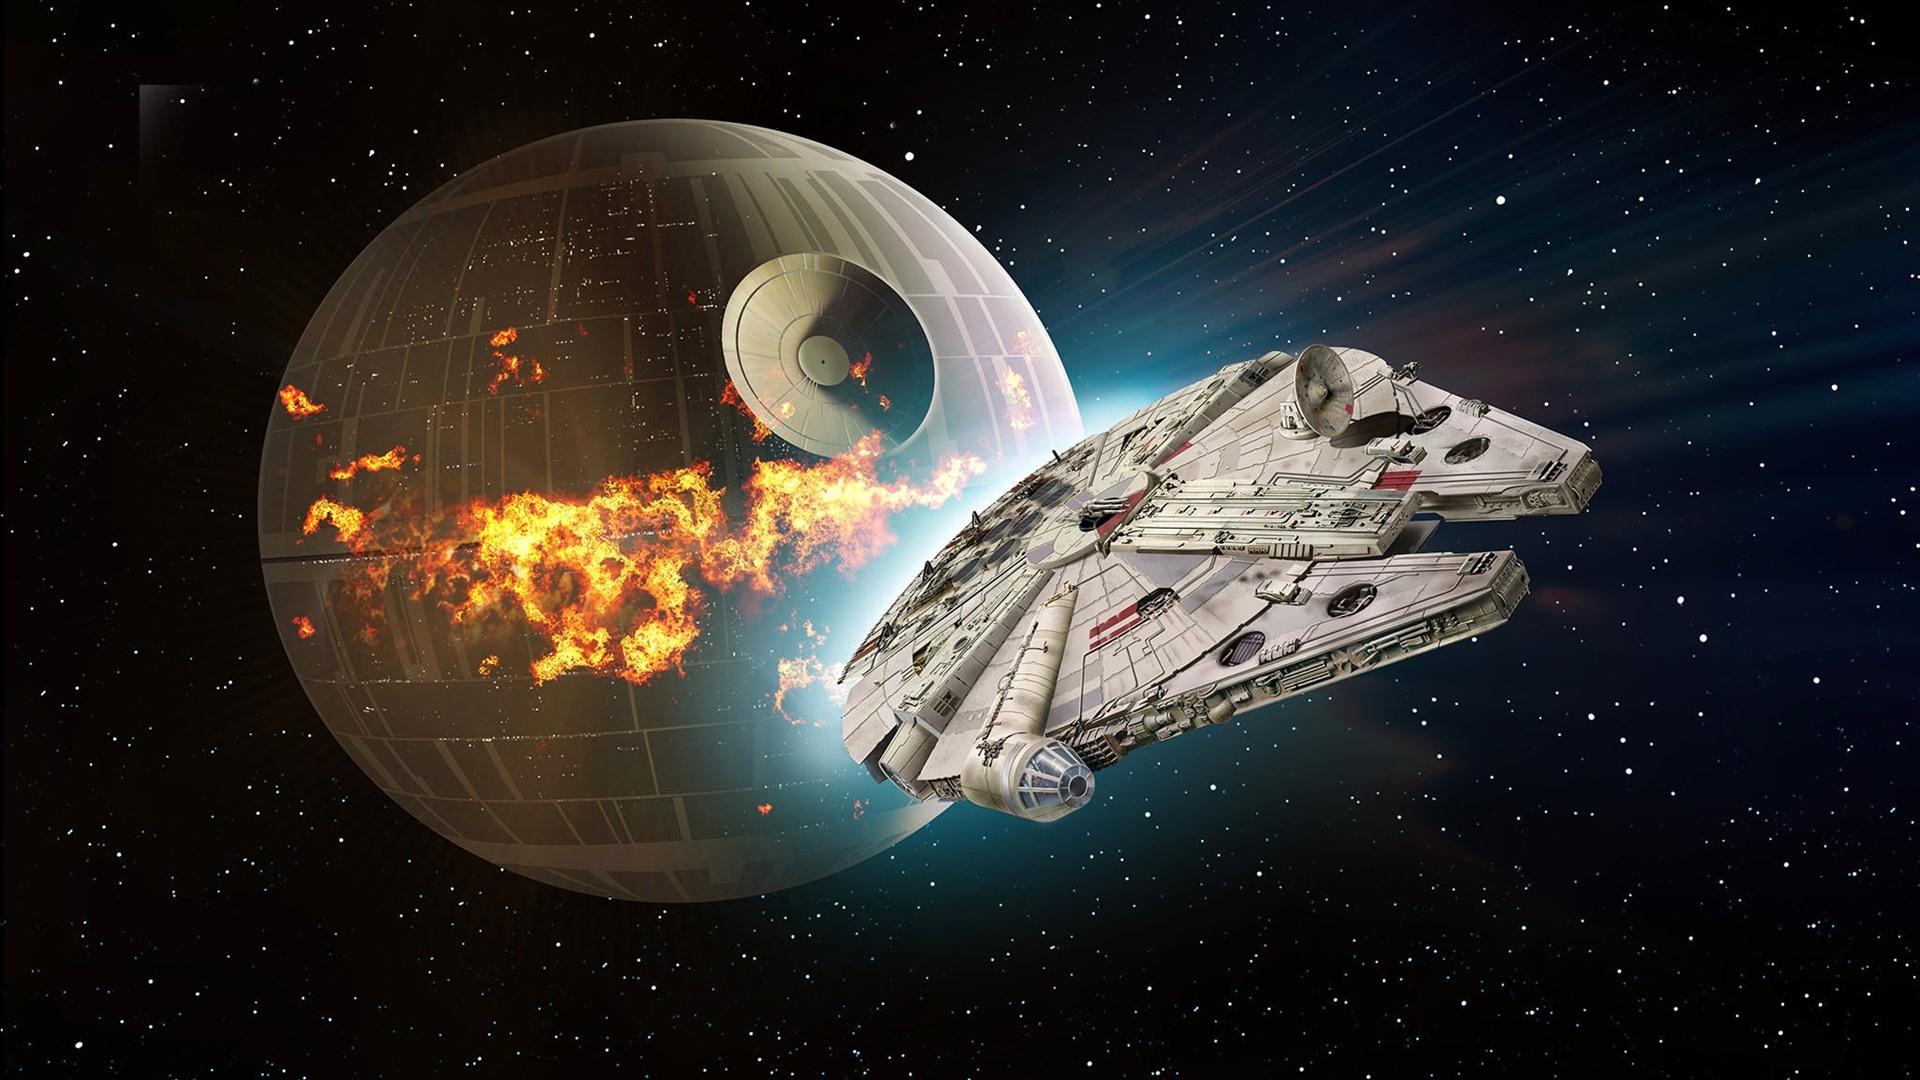 Wallpaper Star Wars Death Star Spaceship 1920x1200 Hd Picture Image